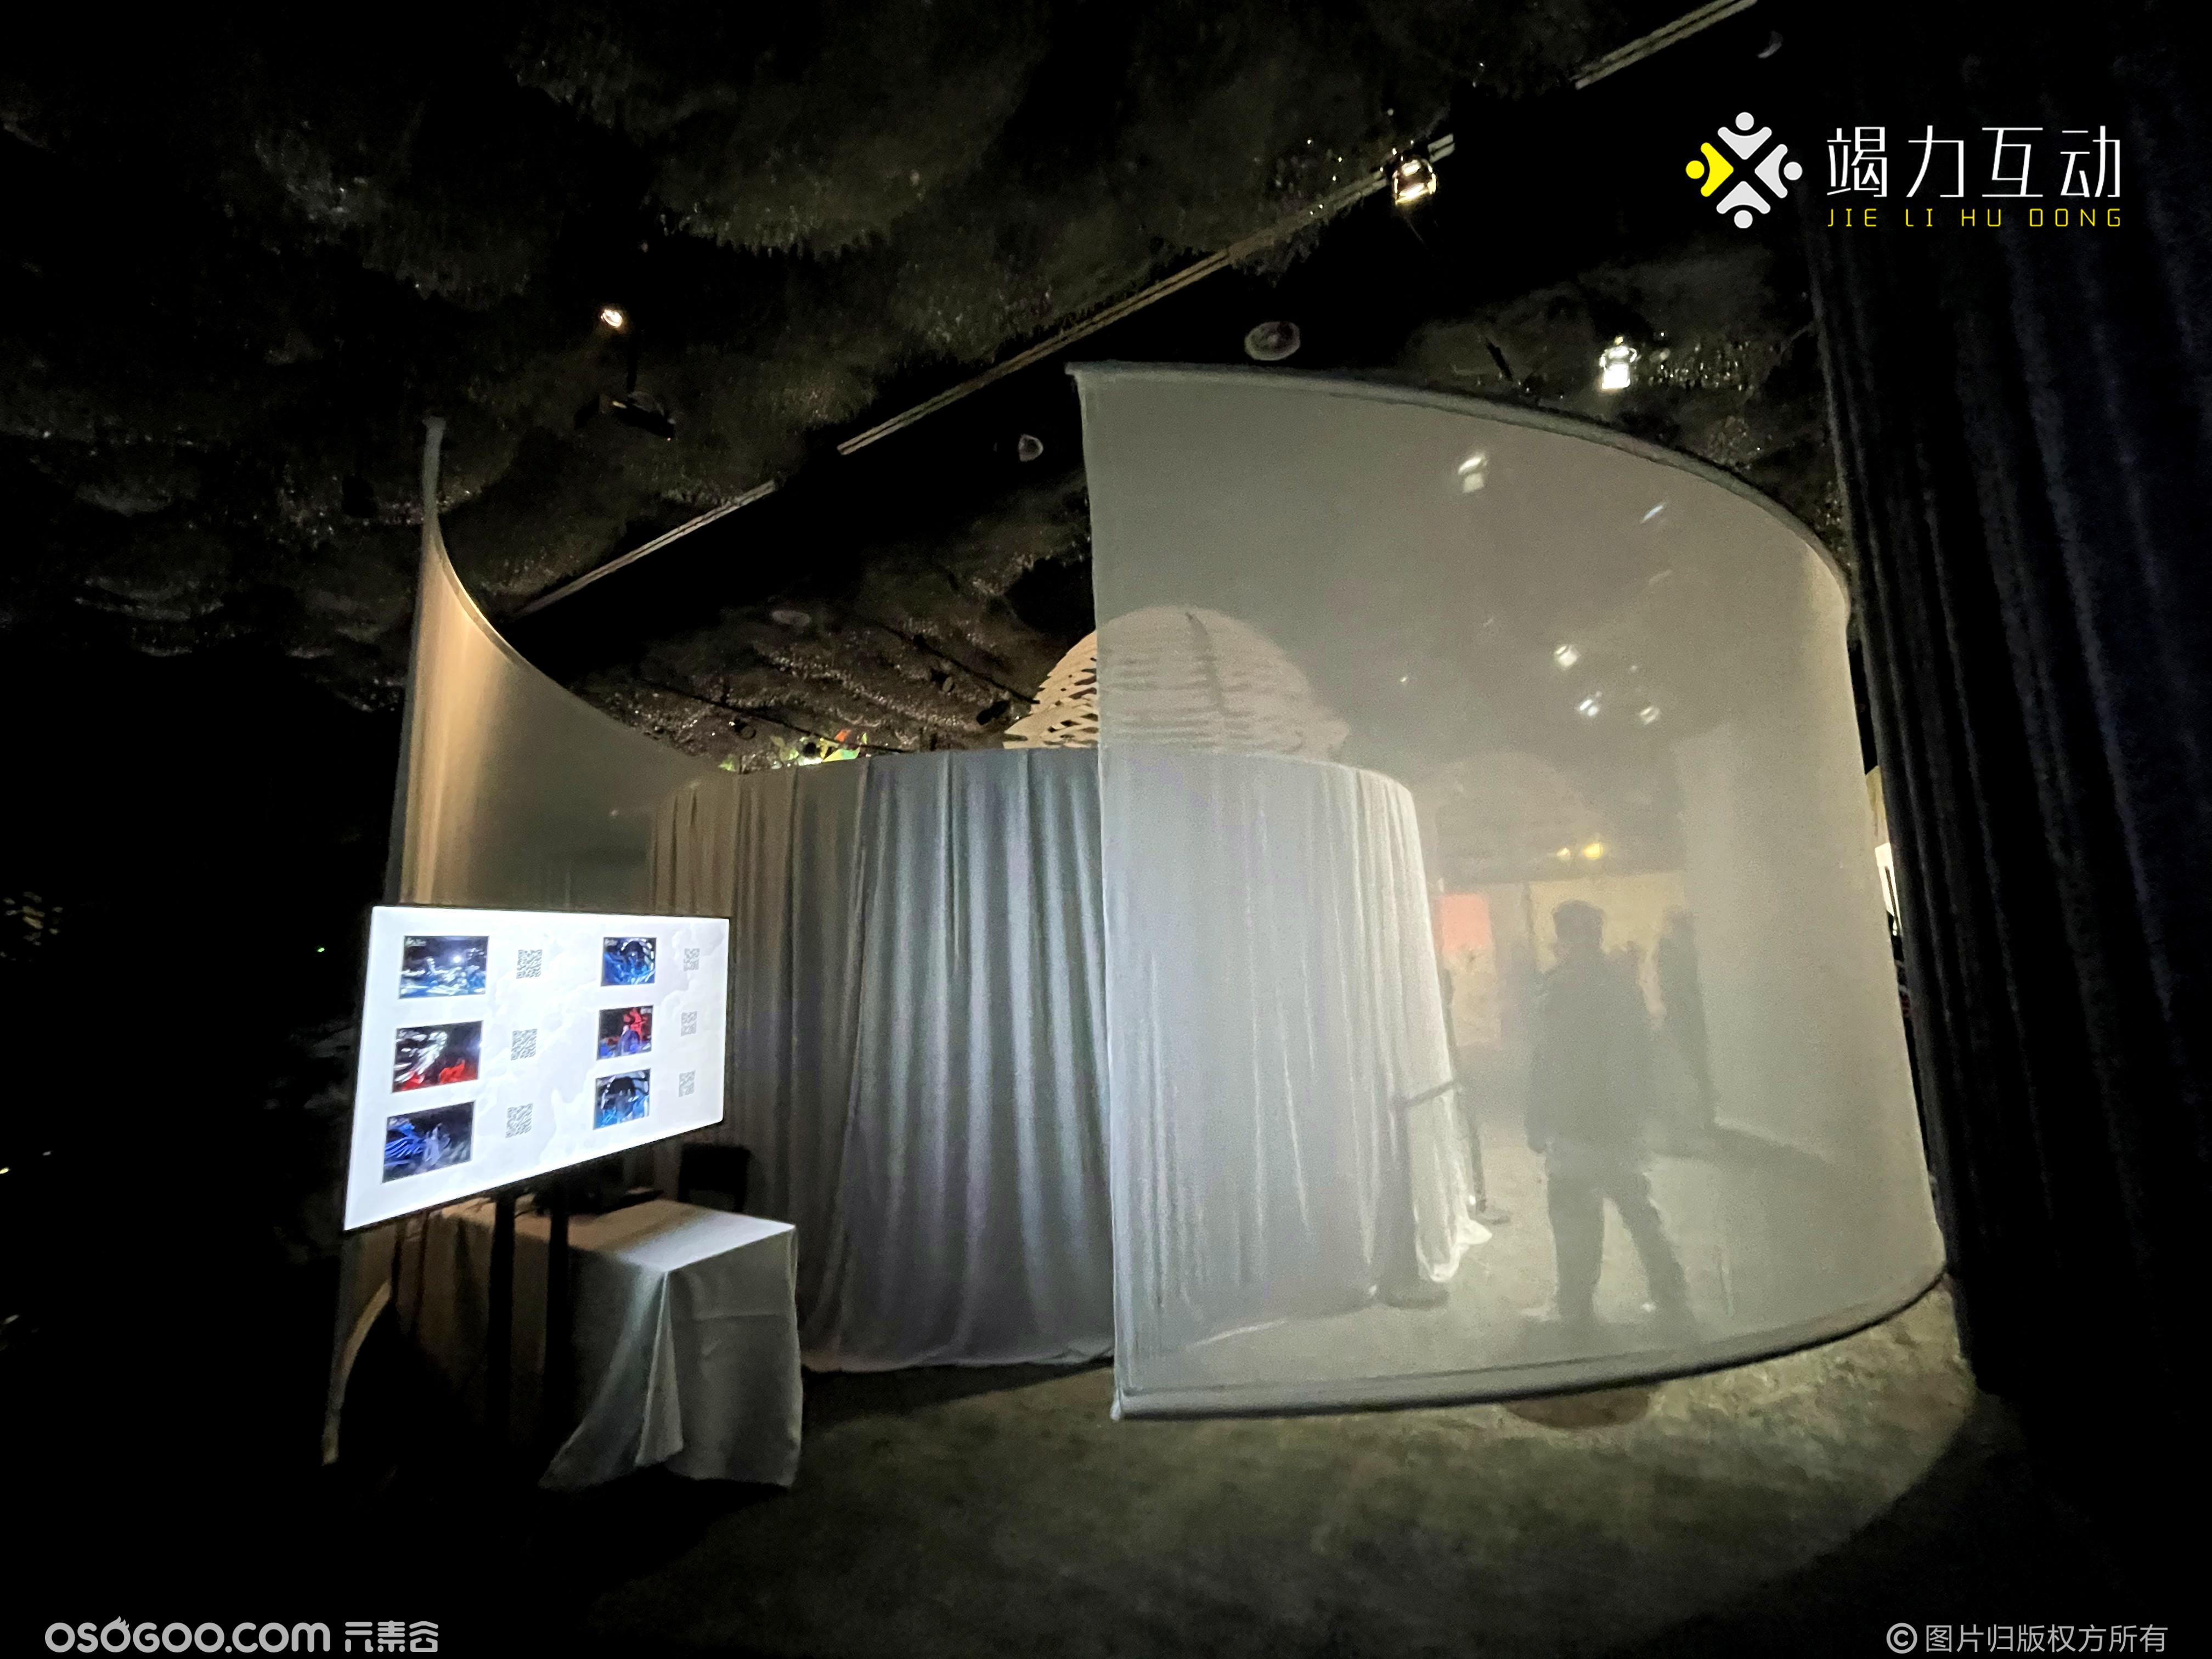 "ArtizStudio""杨紫光影艺术展""上海【光绘子弹时间】"